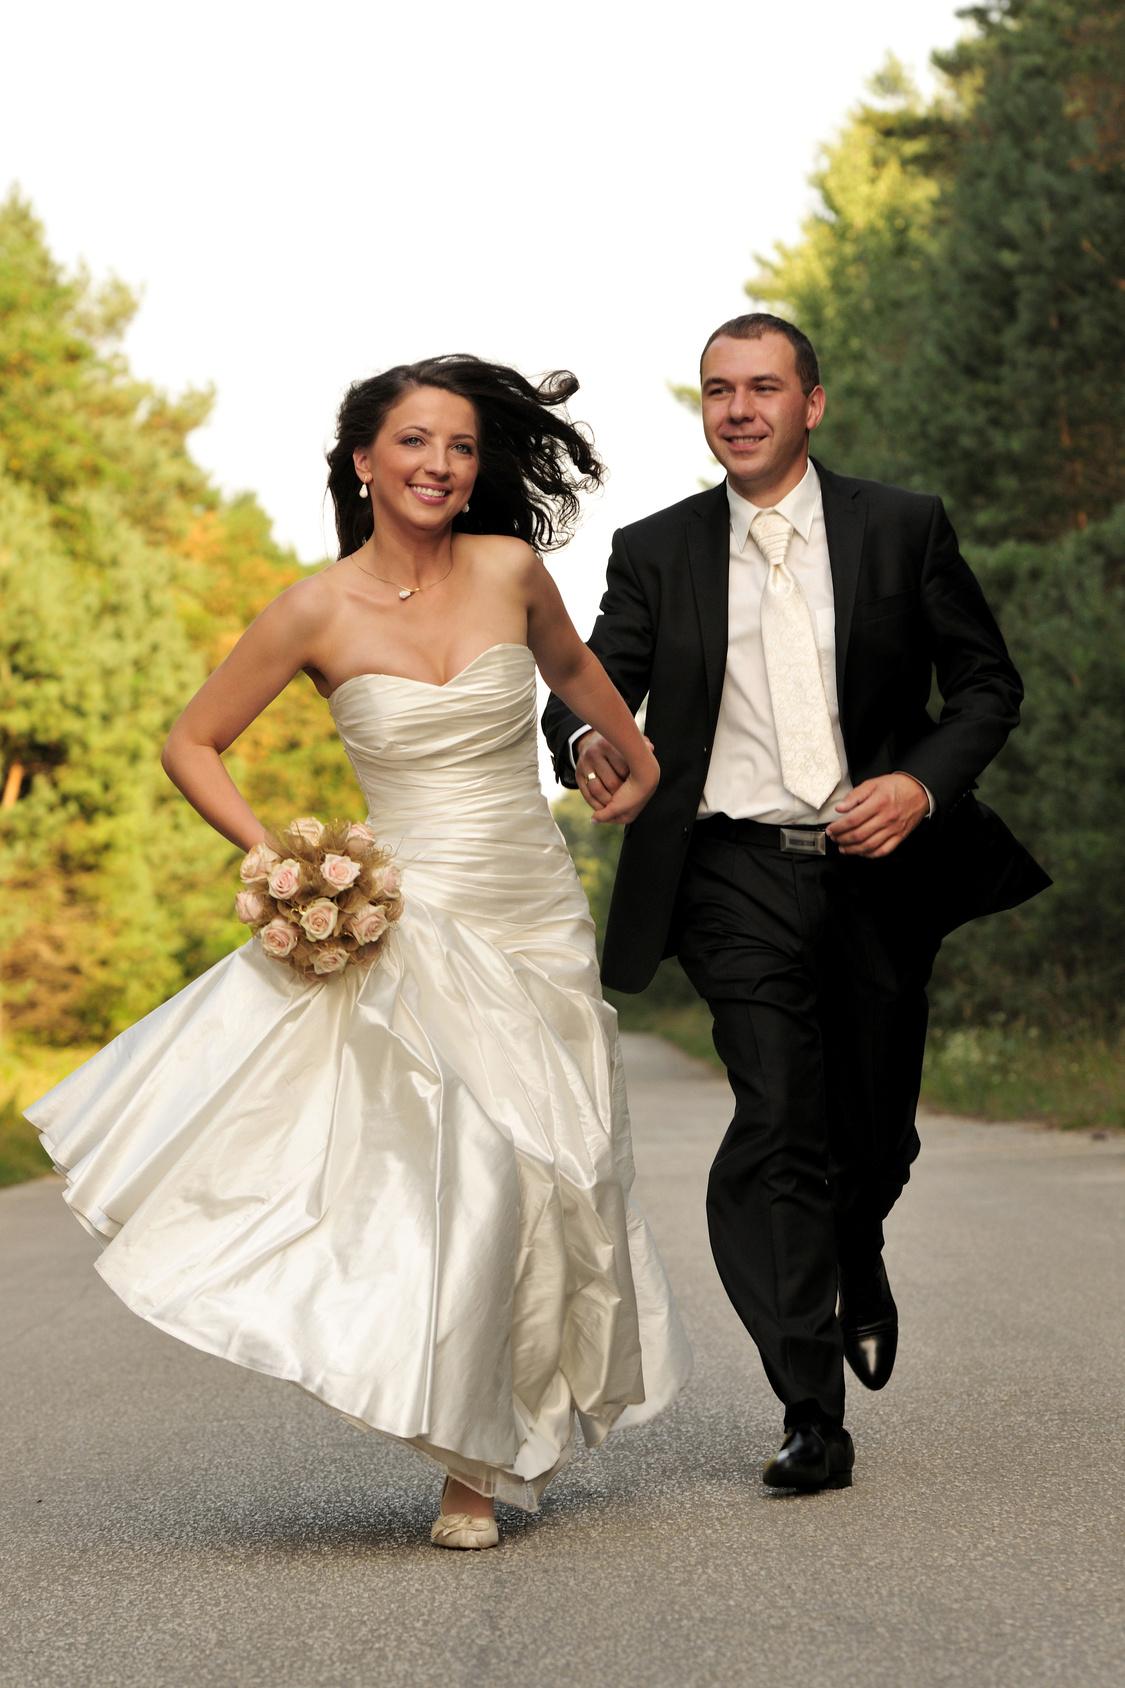 Kristin-Leske-Hochzeit0009s